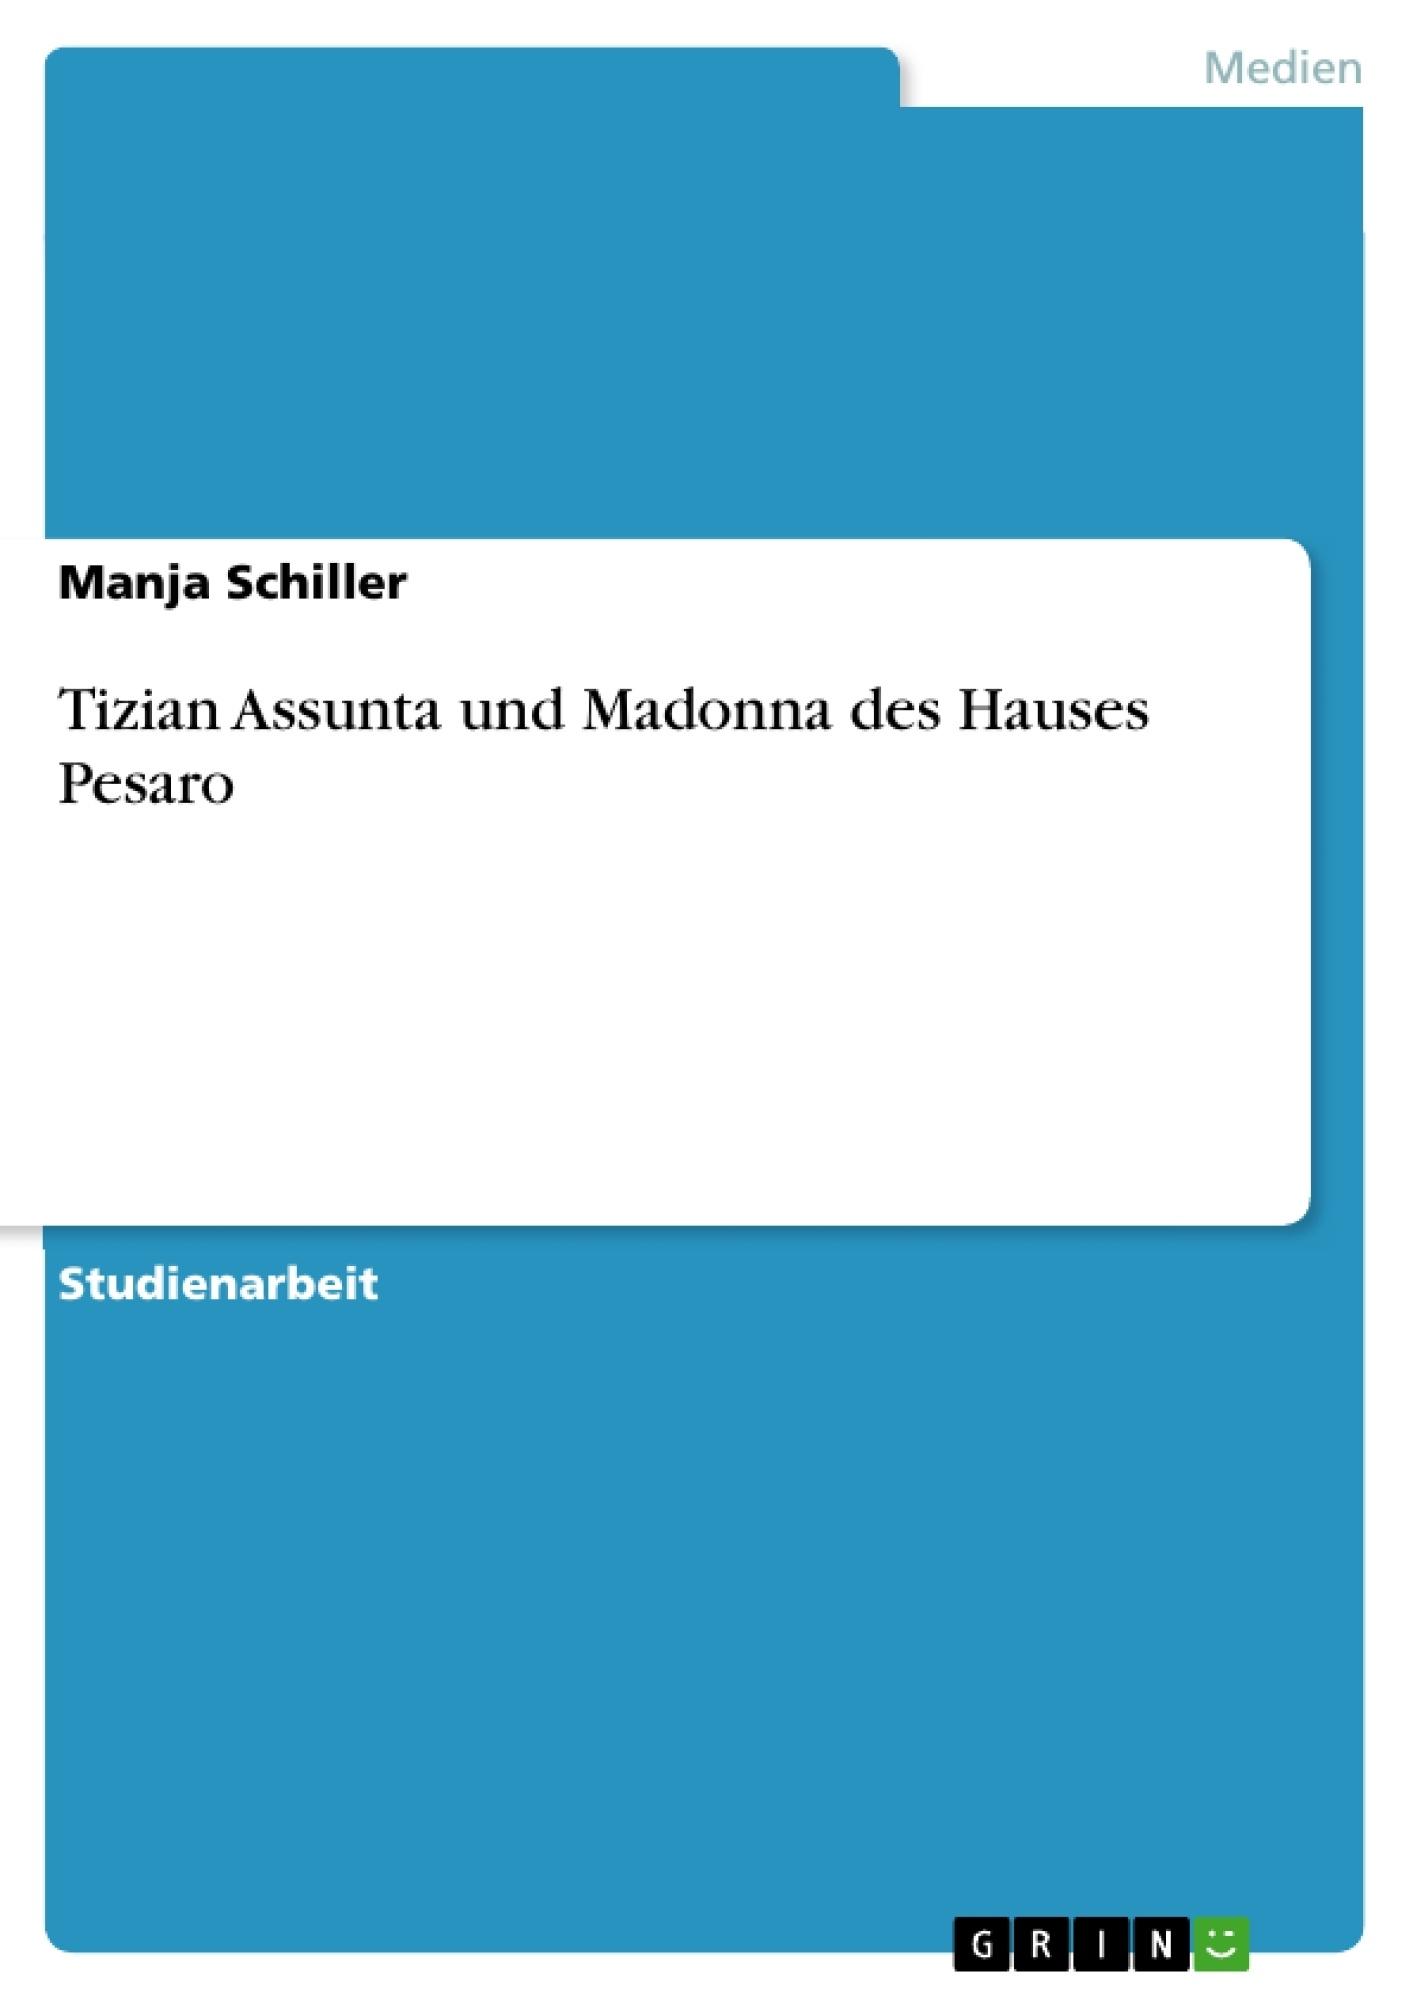 Titel: Tizian Assunta und Madonna des Hauses Pesaro